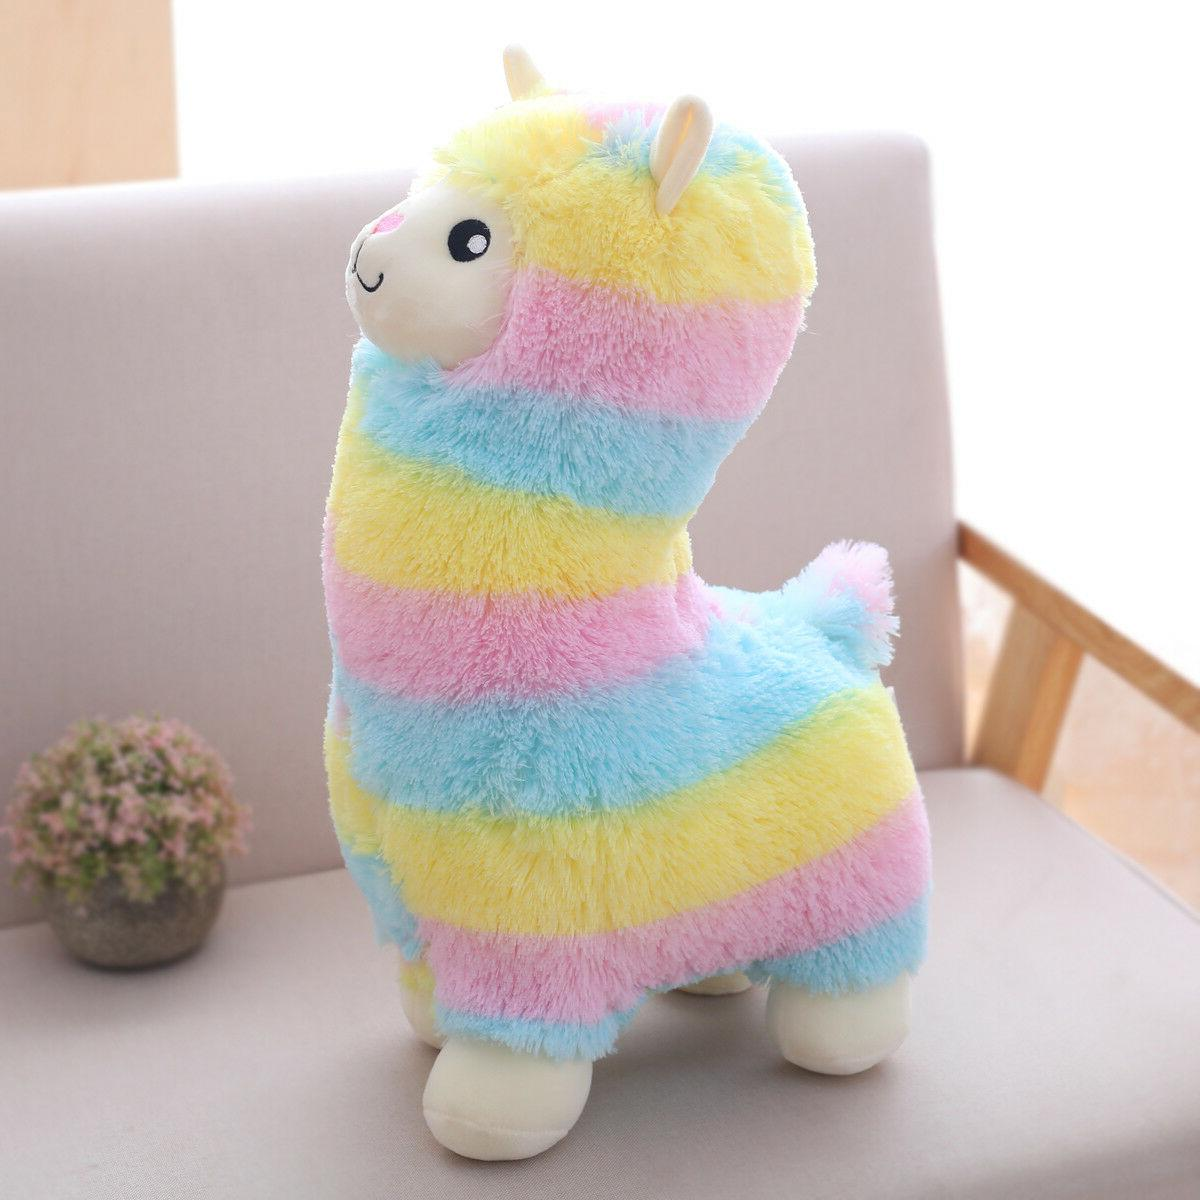 Winsterch Toy Llama Animal 17.7 inches